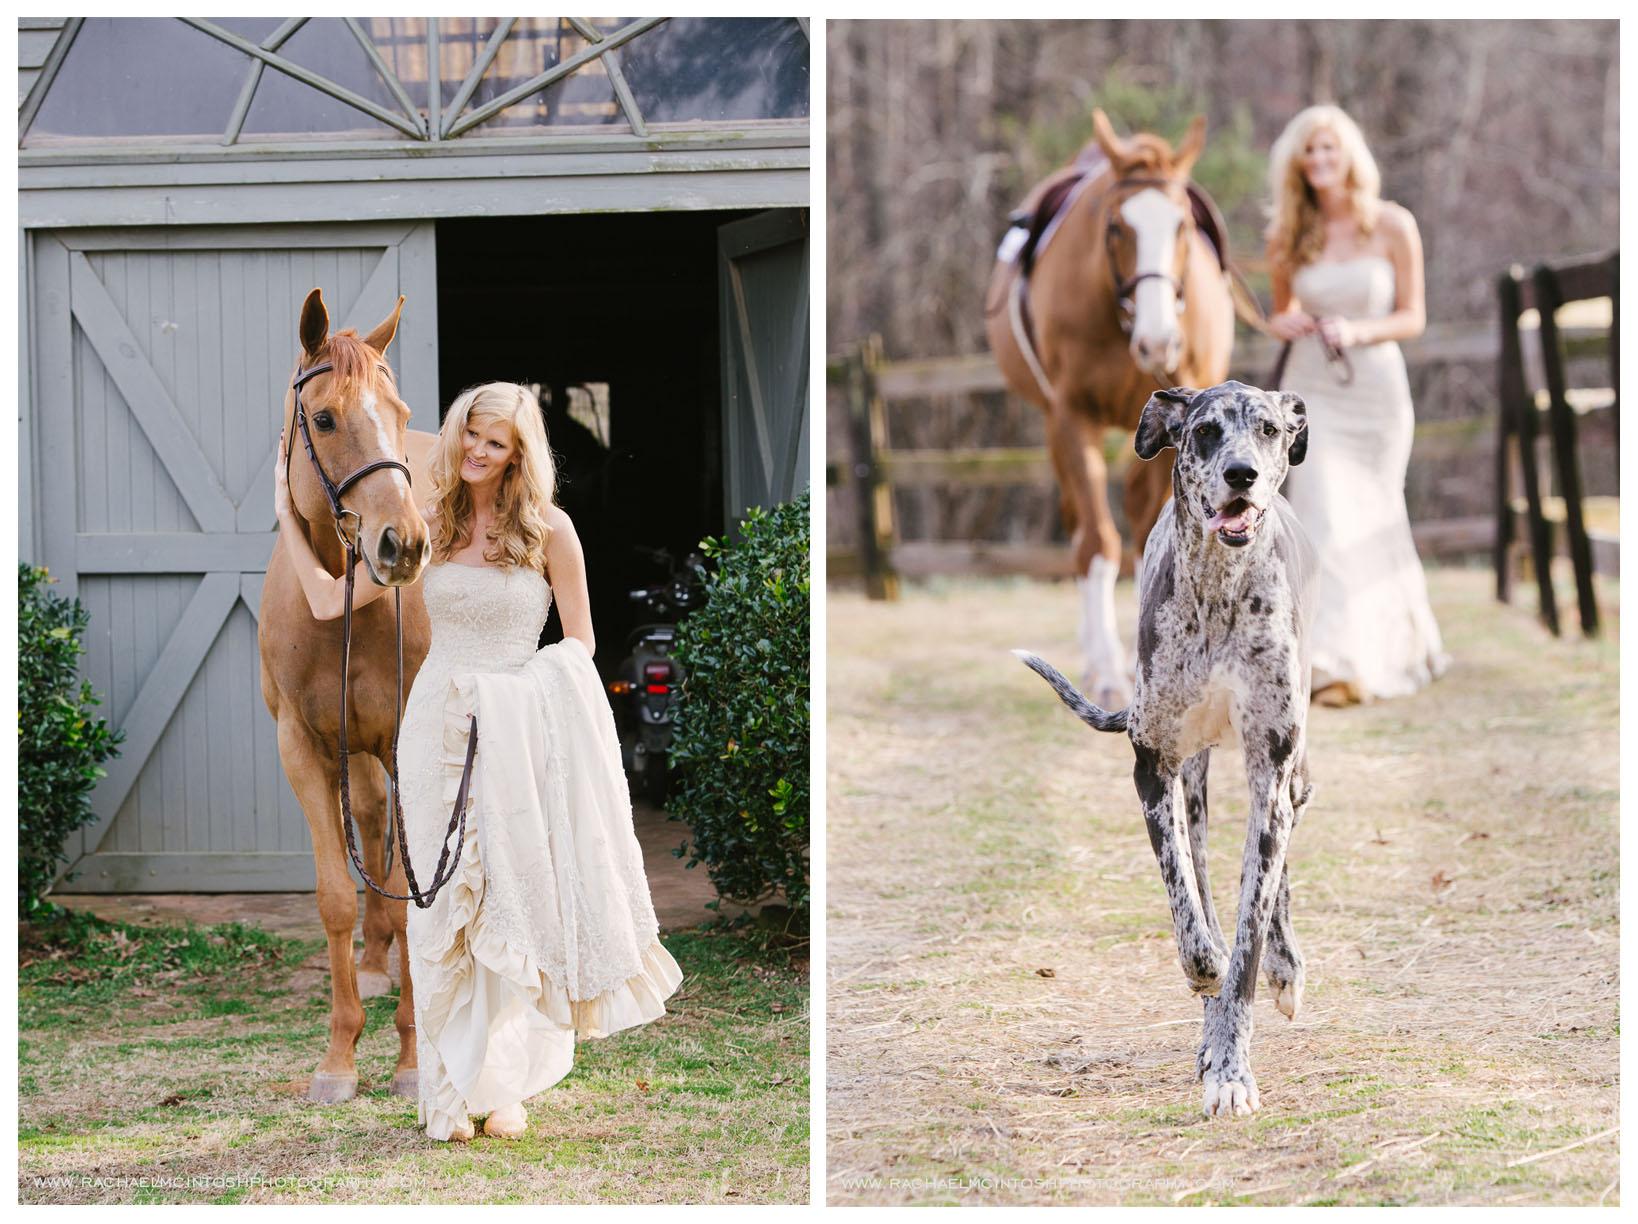 NC Wedding Photography - Bridal Portrait Session